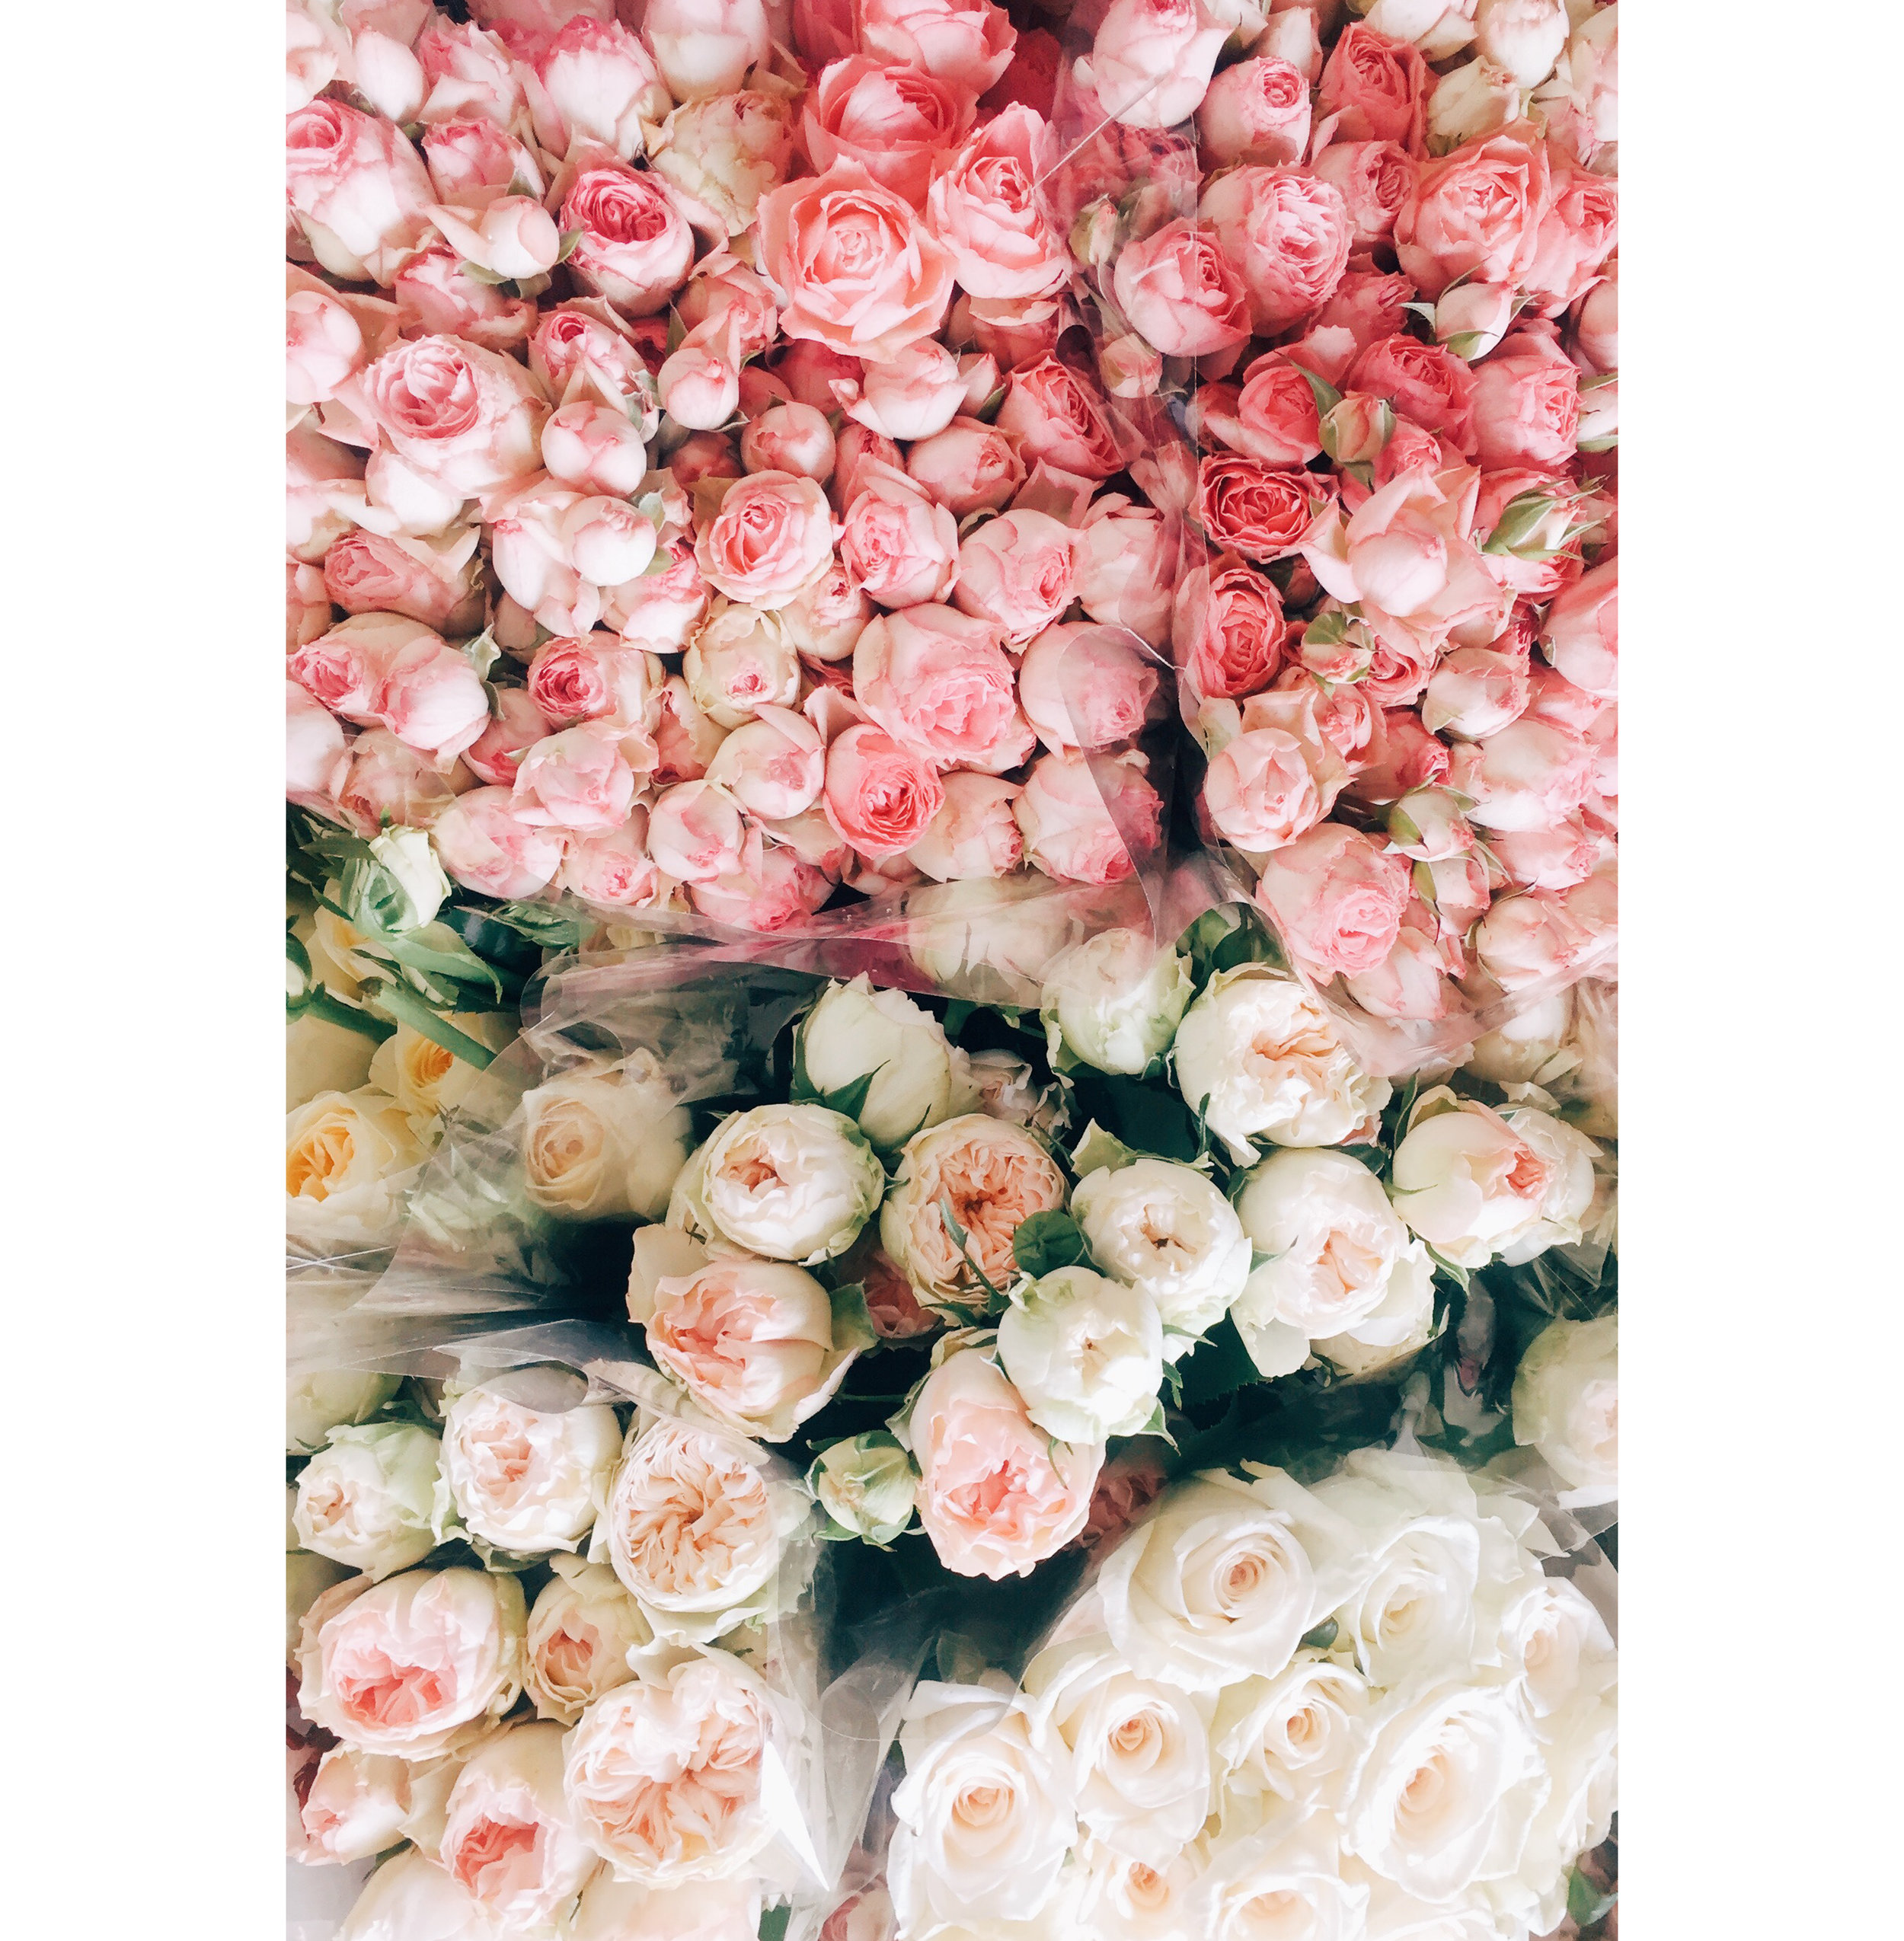 Blush Colored Roses.jpg